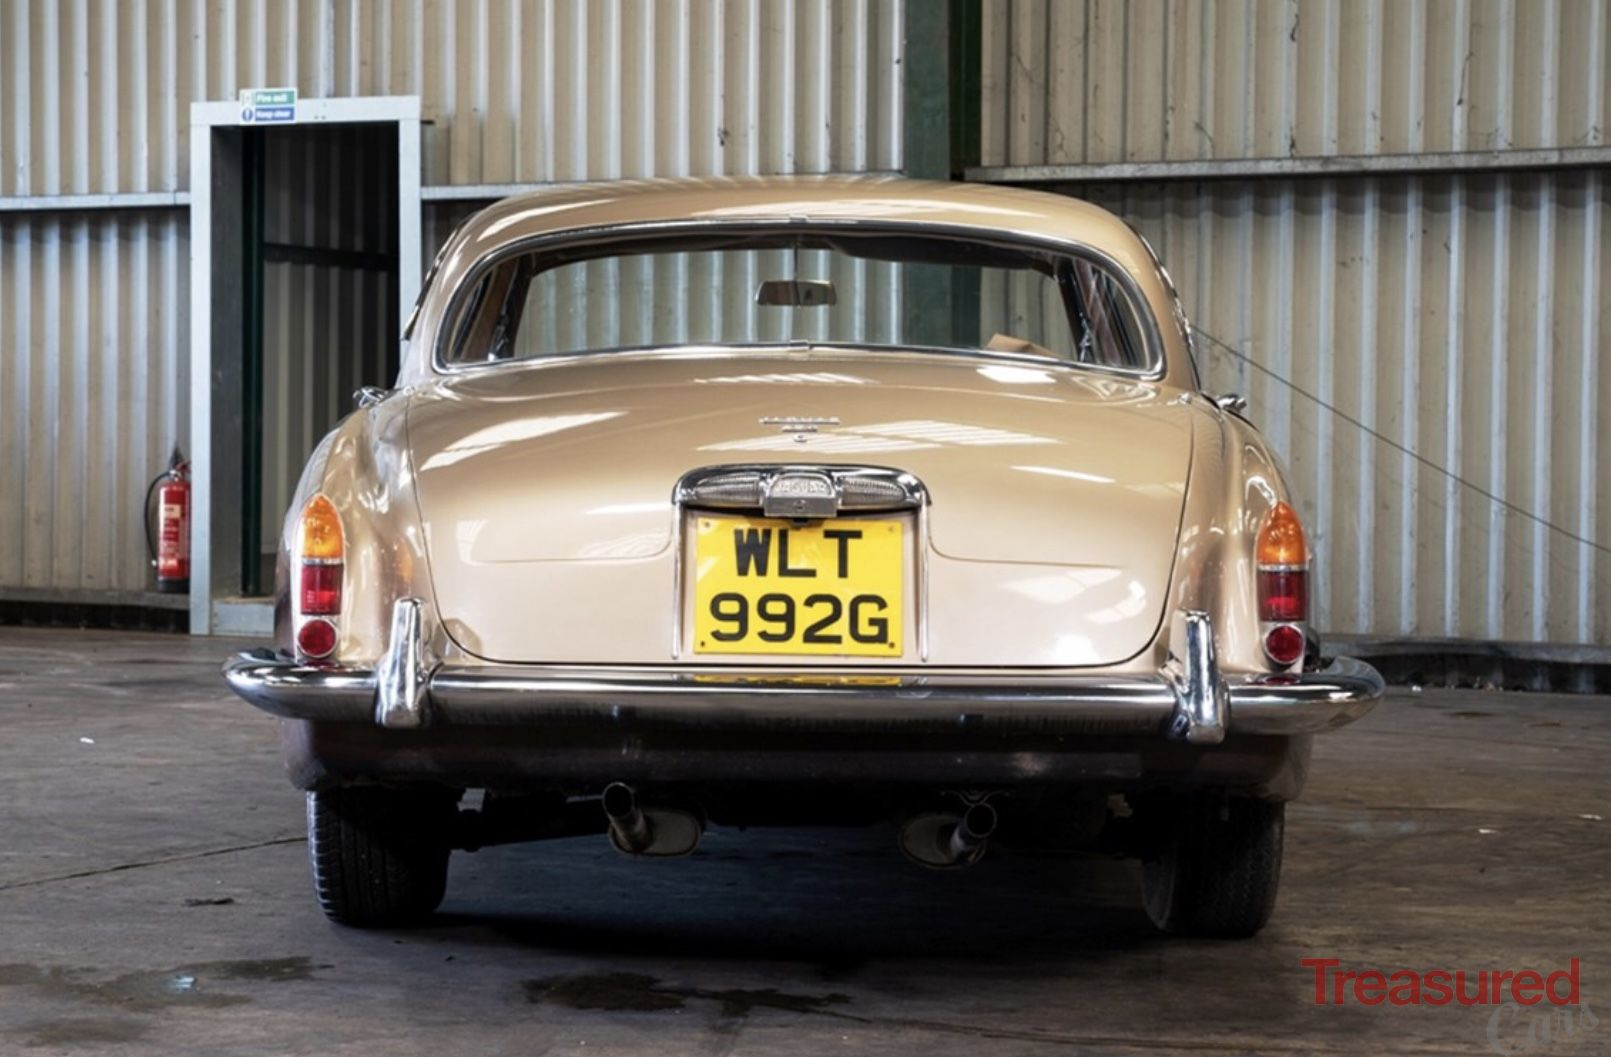 1968 Jaguar 420 G Classic Cars for sale - Treasured Cars